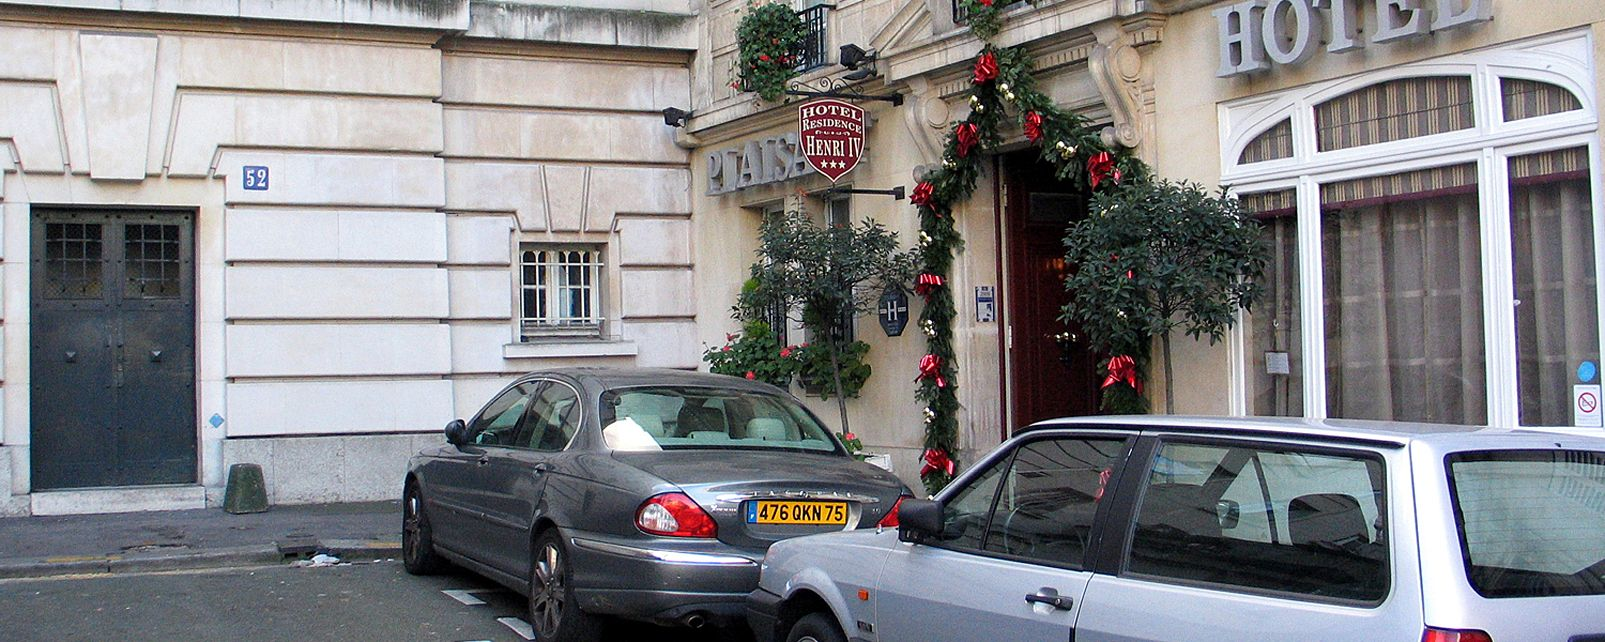 Hotel Henri IV Hotel Residence Paris